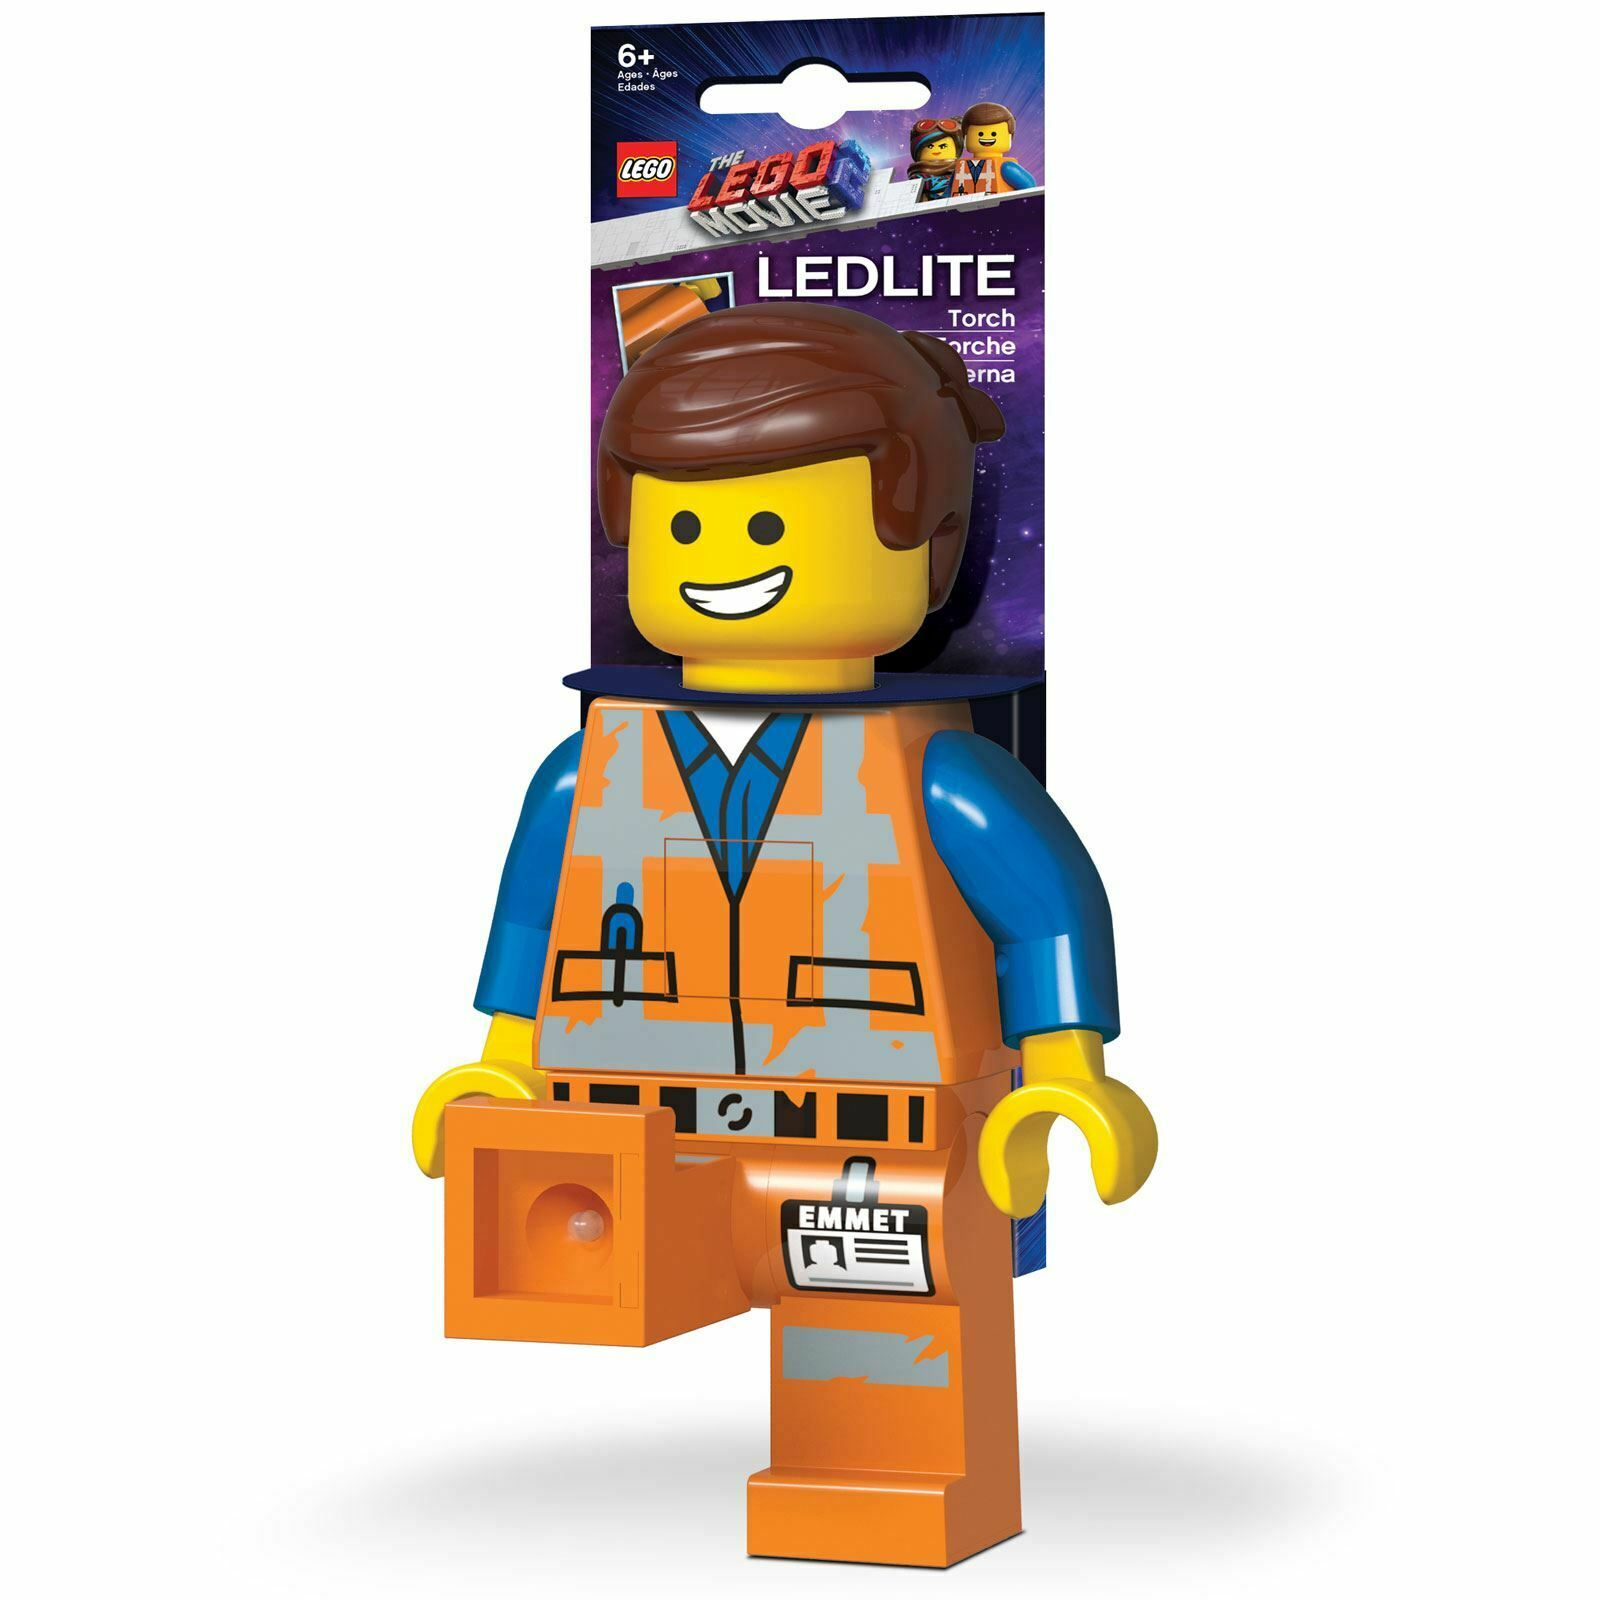 Ufficiale Lego Movie Movie Movie 2 Emmet Torcia 21cm - Led Bedsight Luce con Pesca la Lenza 98d16e